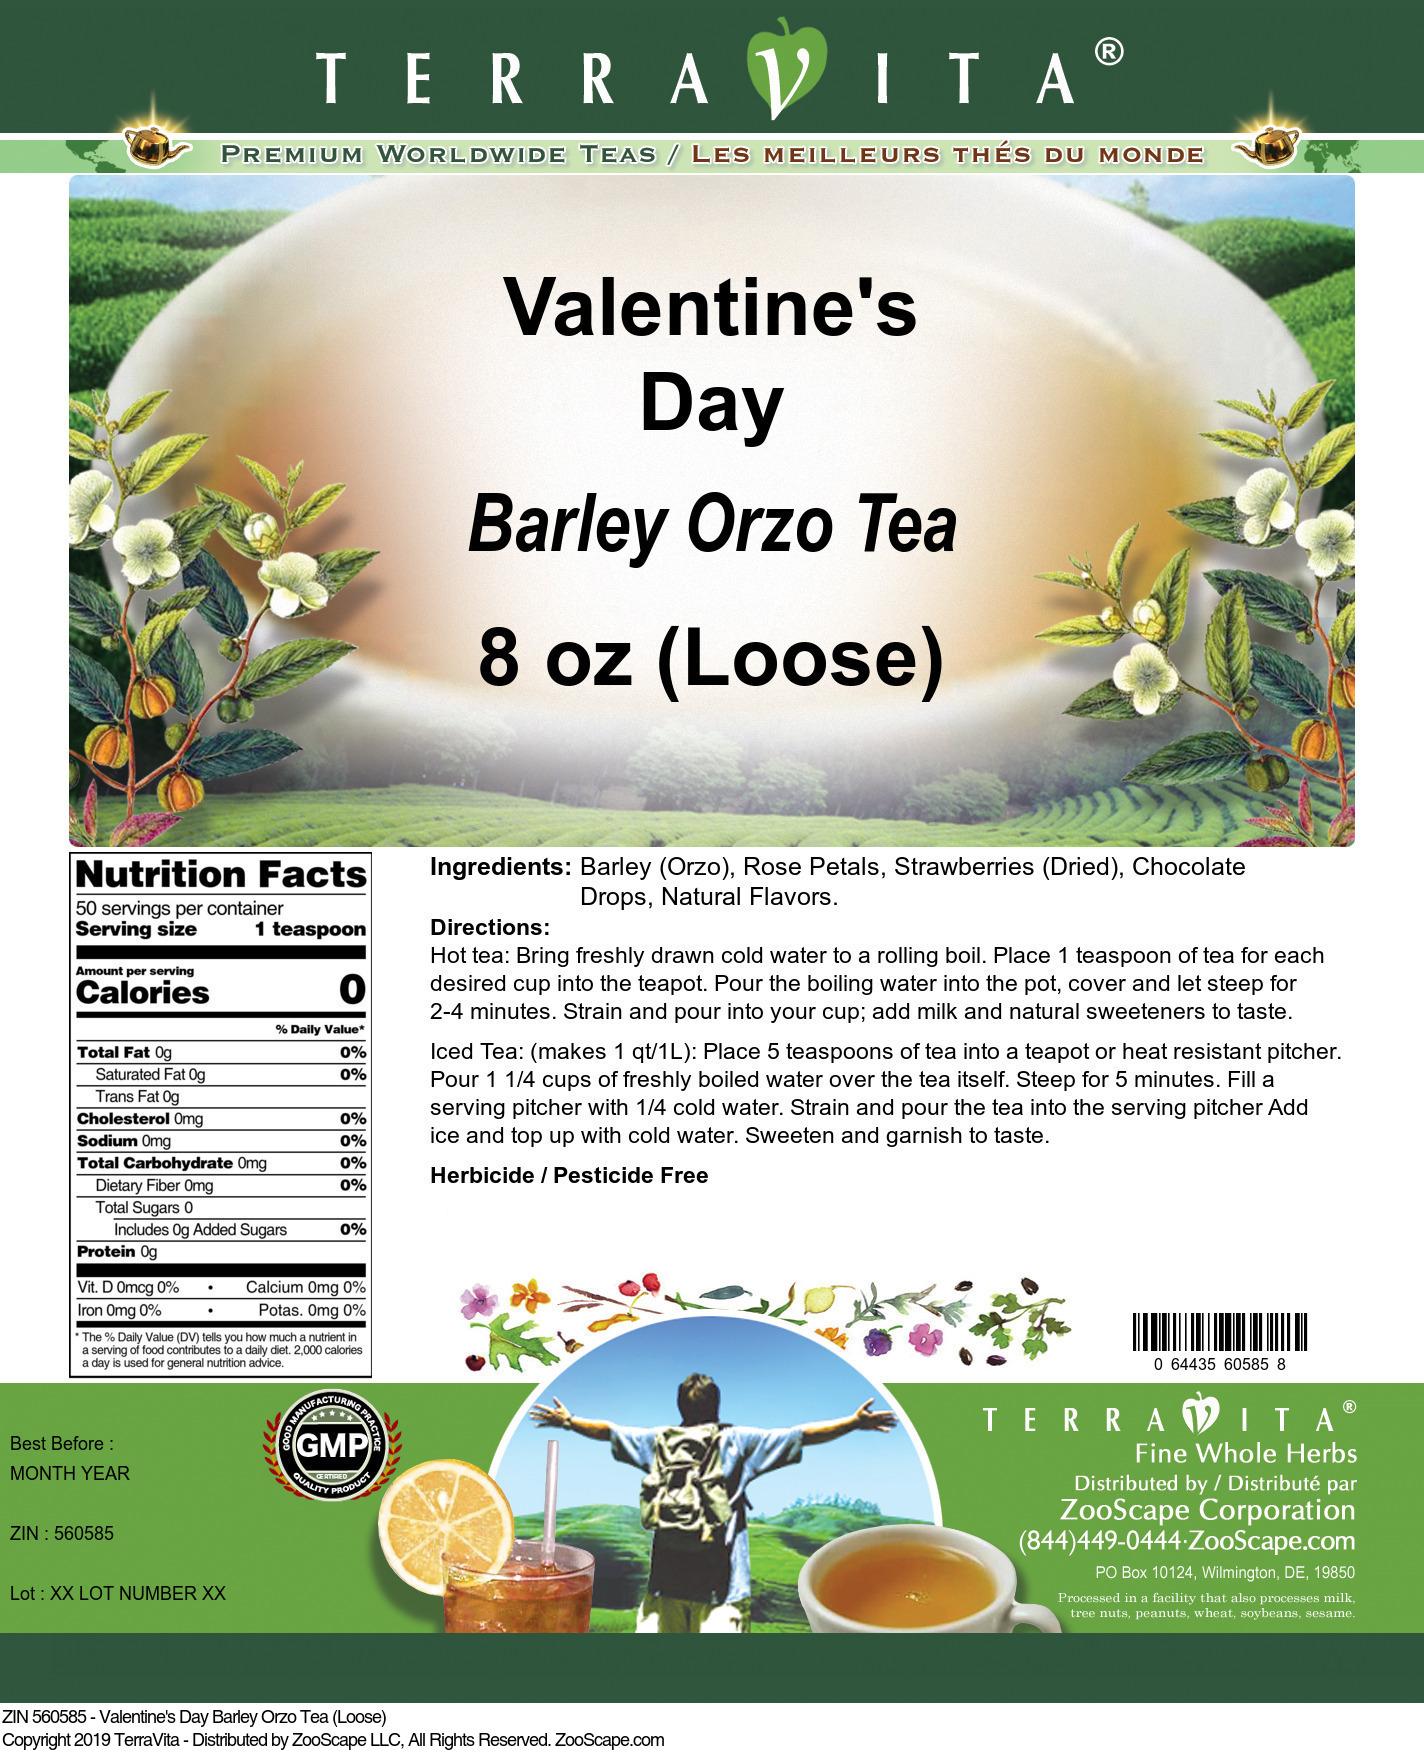 Valentine's Day Barley Orzo